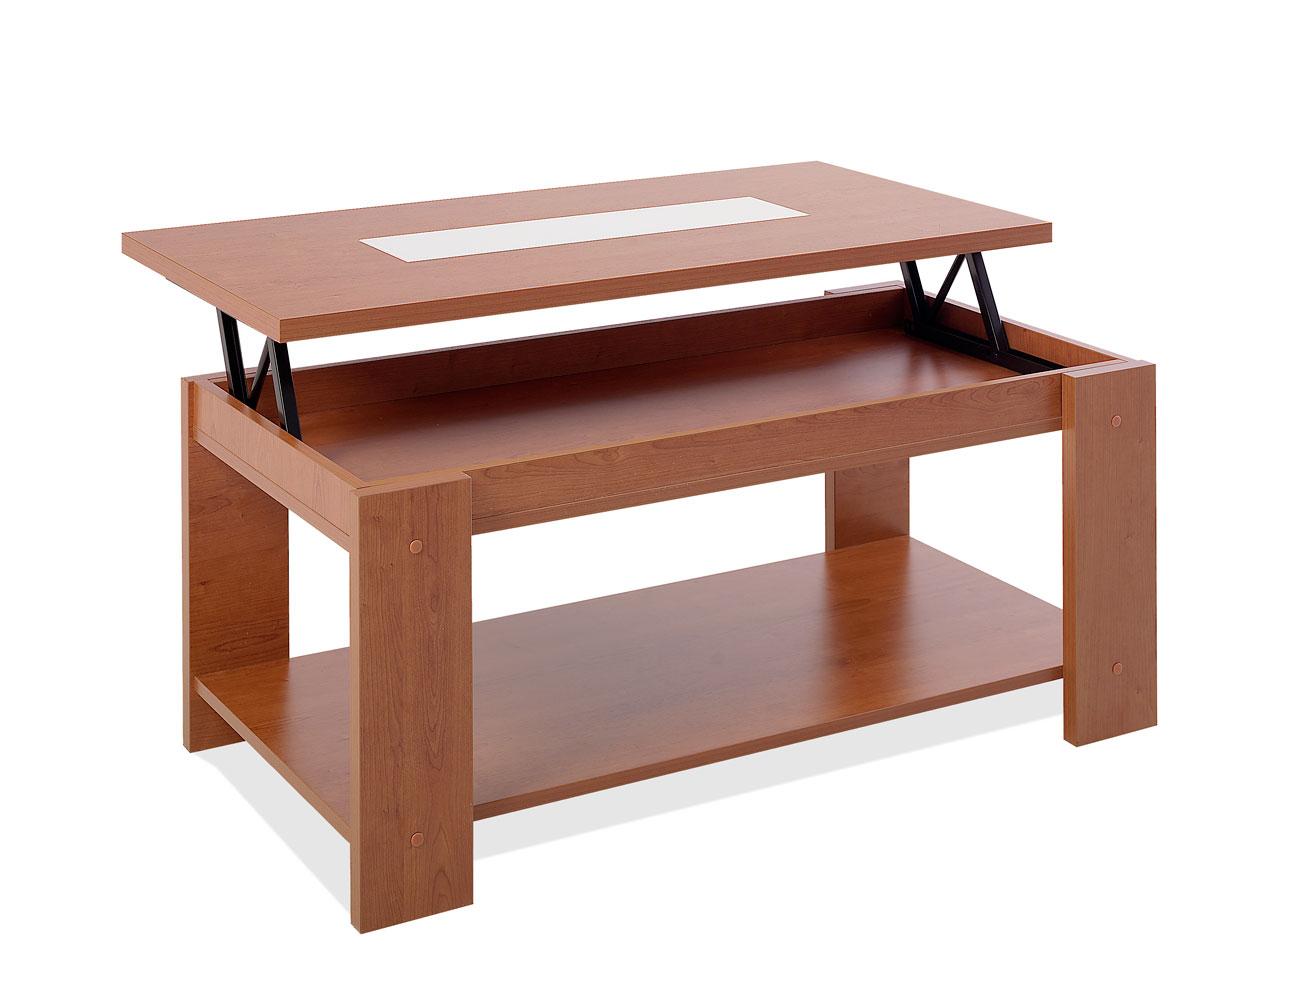 Mesa de centro elevable en cerezo con cristal blanco 4643 - Mesa de centro elevable ...